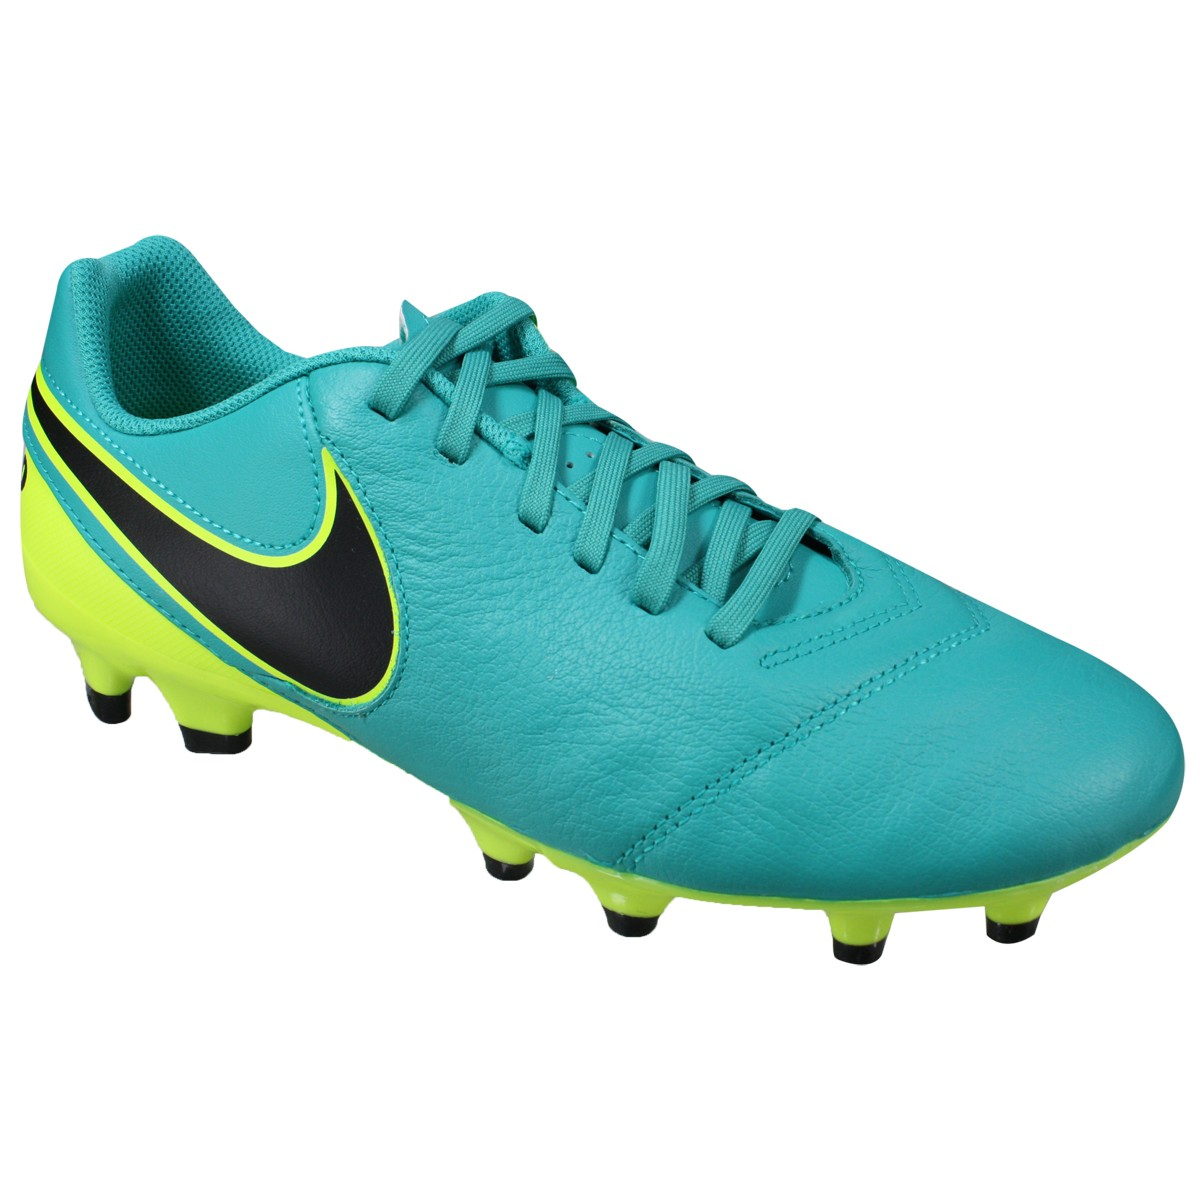 b865538a0b Chuteira Nike Tiempo Genio II Leather FG 819213-307 - Verde ...